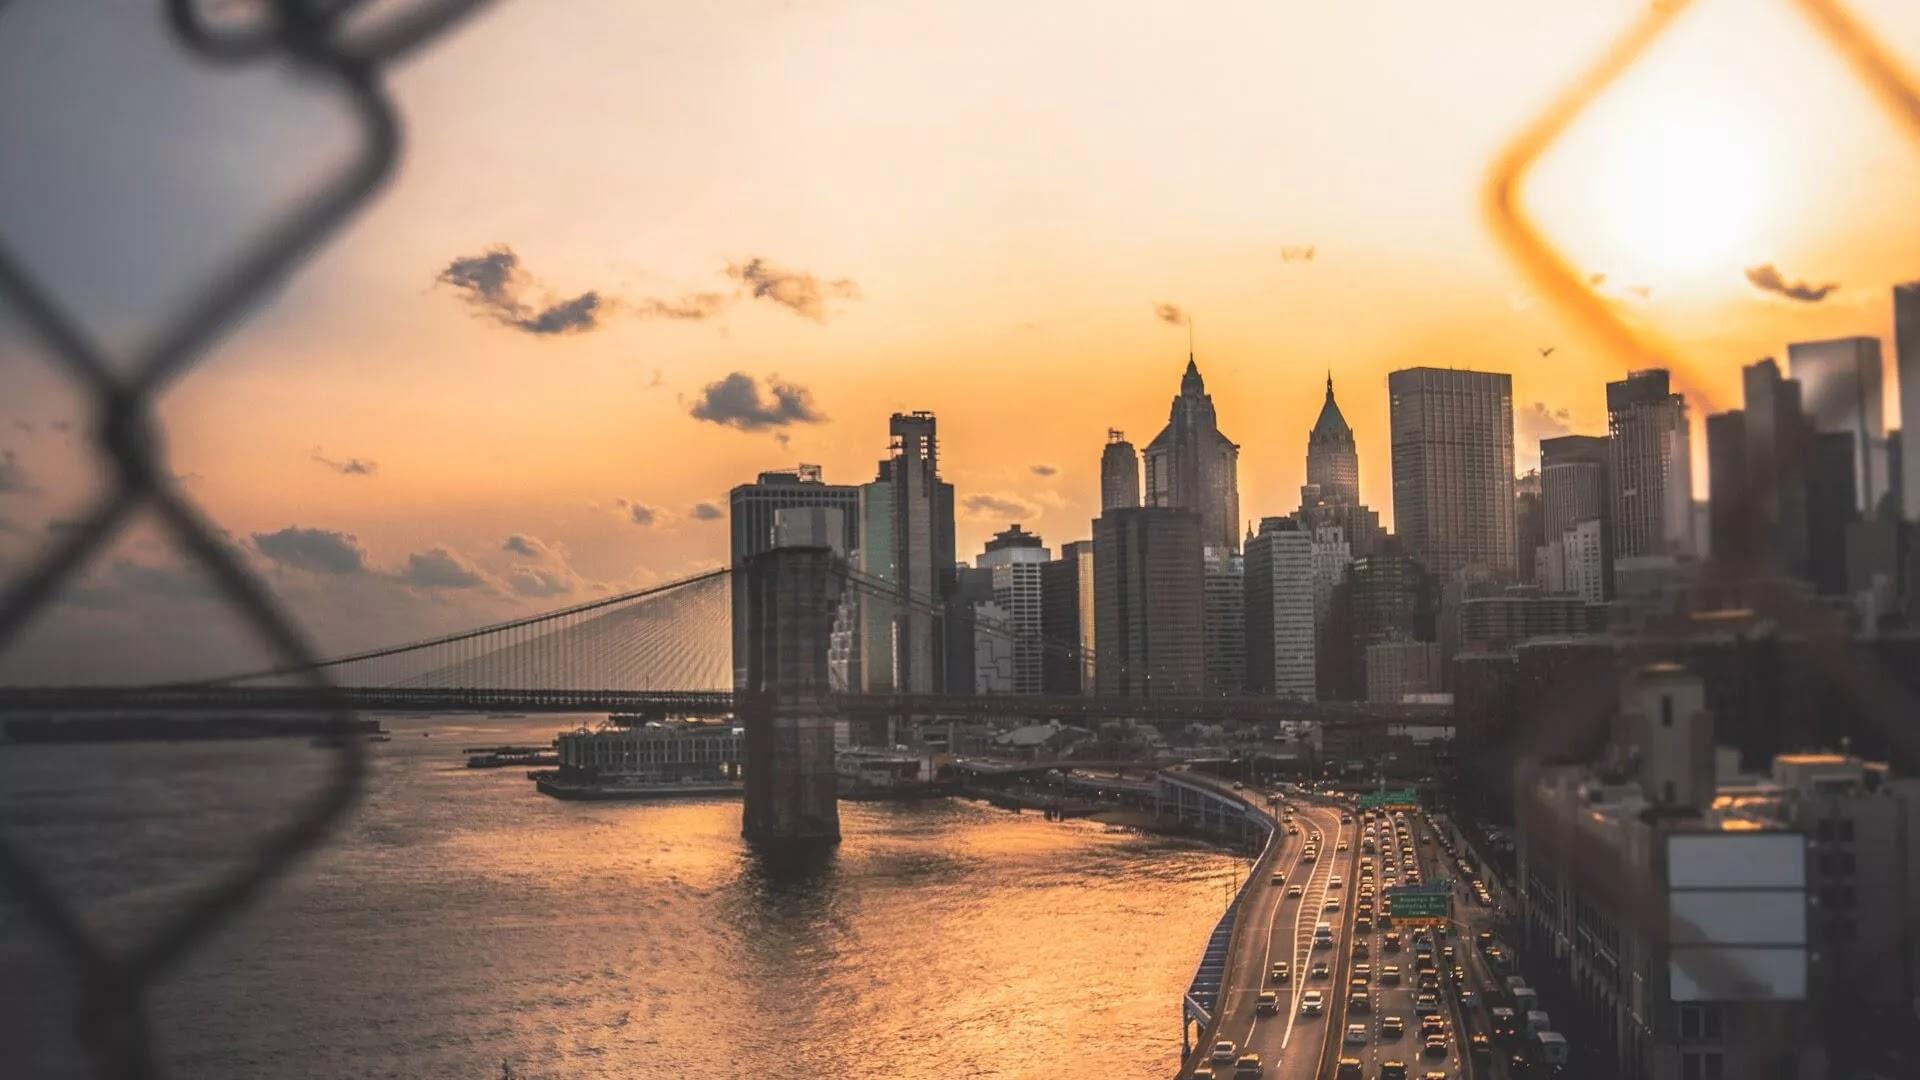 new york city evening image